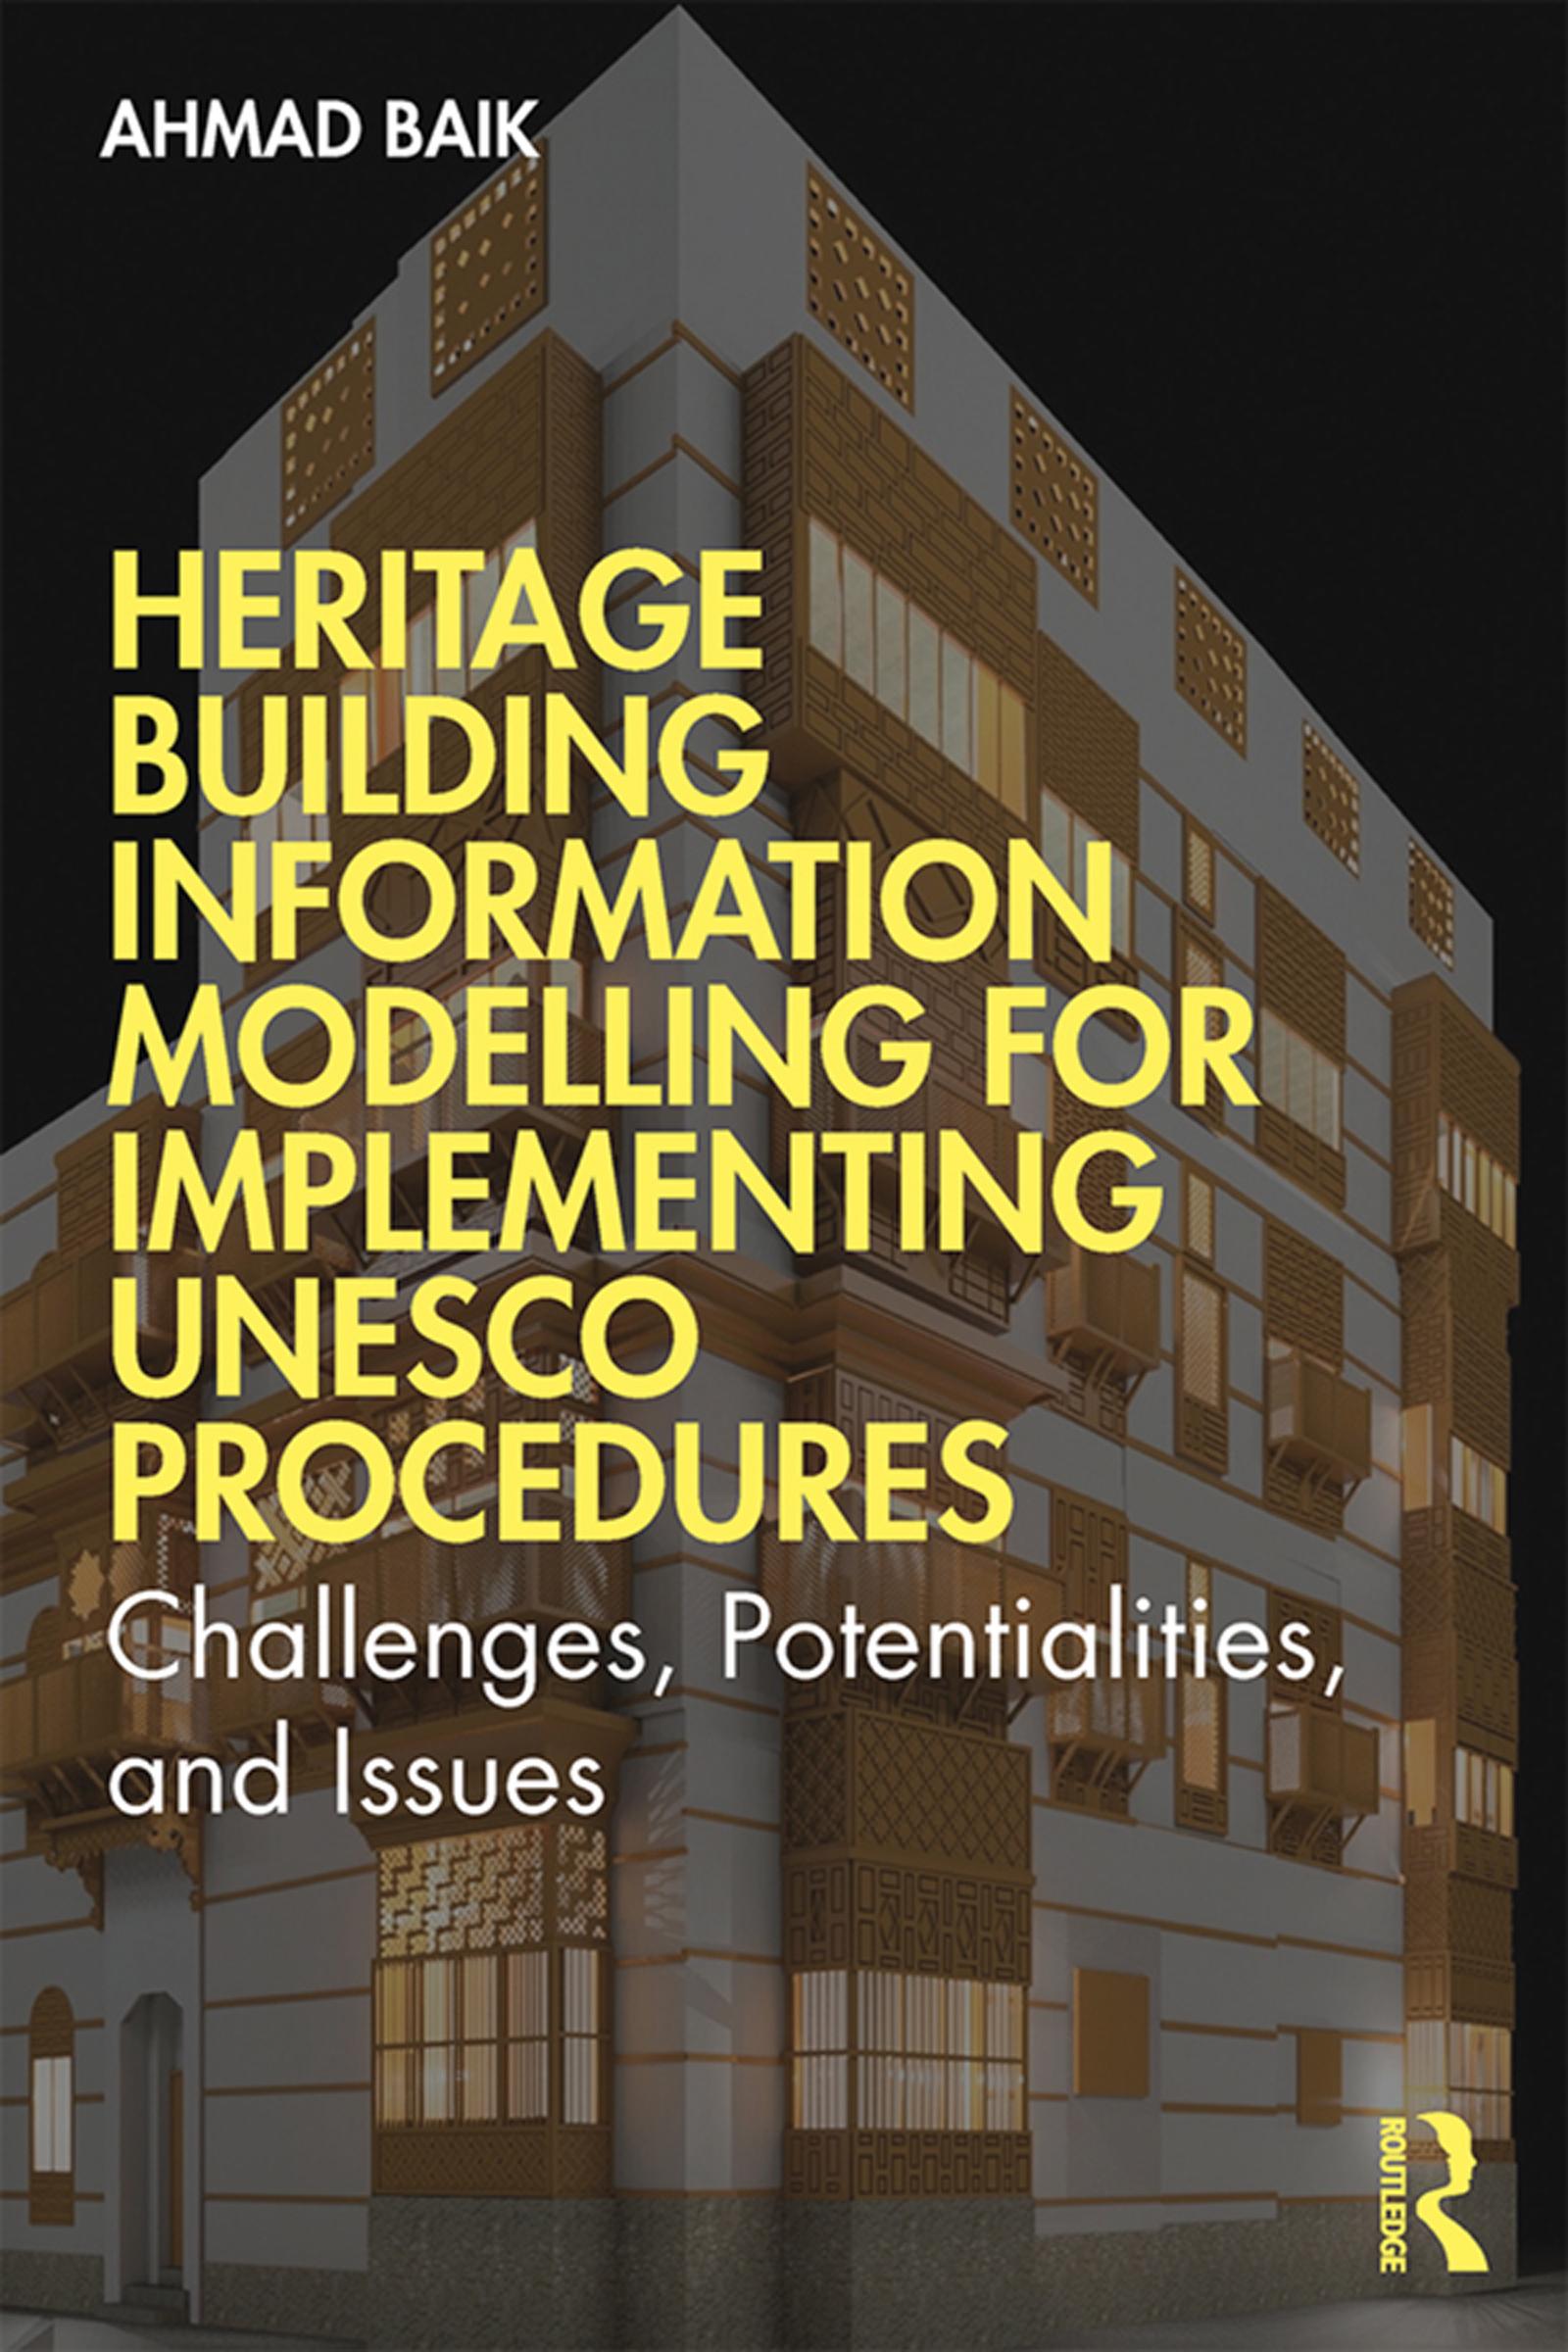 Heritage Building Information Modelling for Implementing UNESCO Procedures